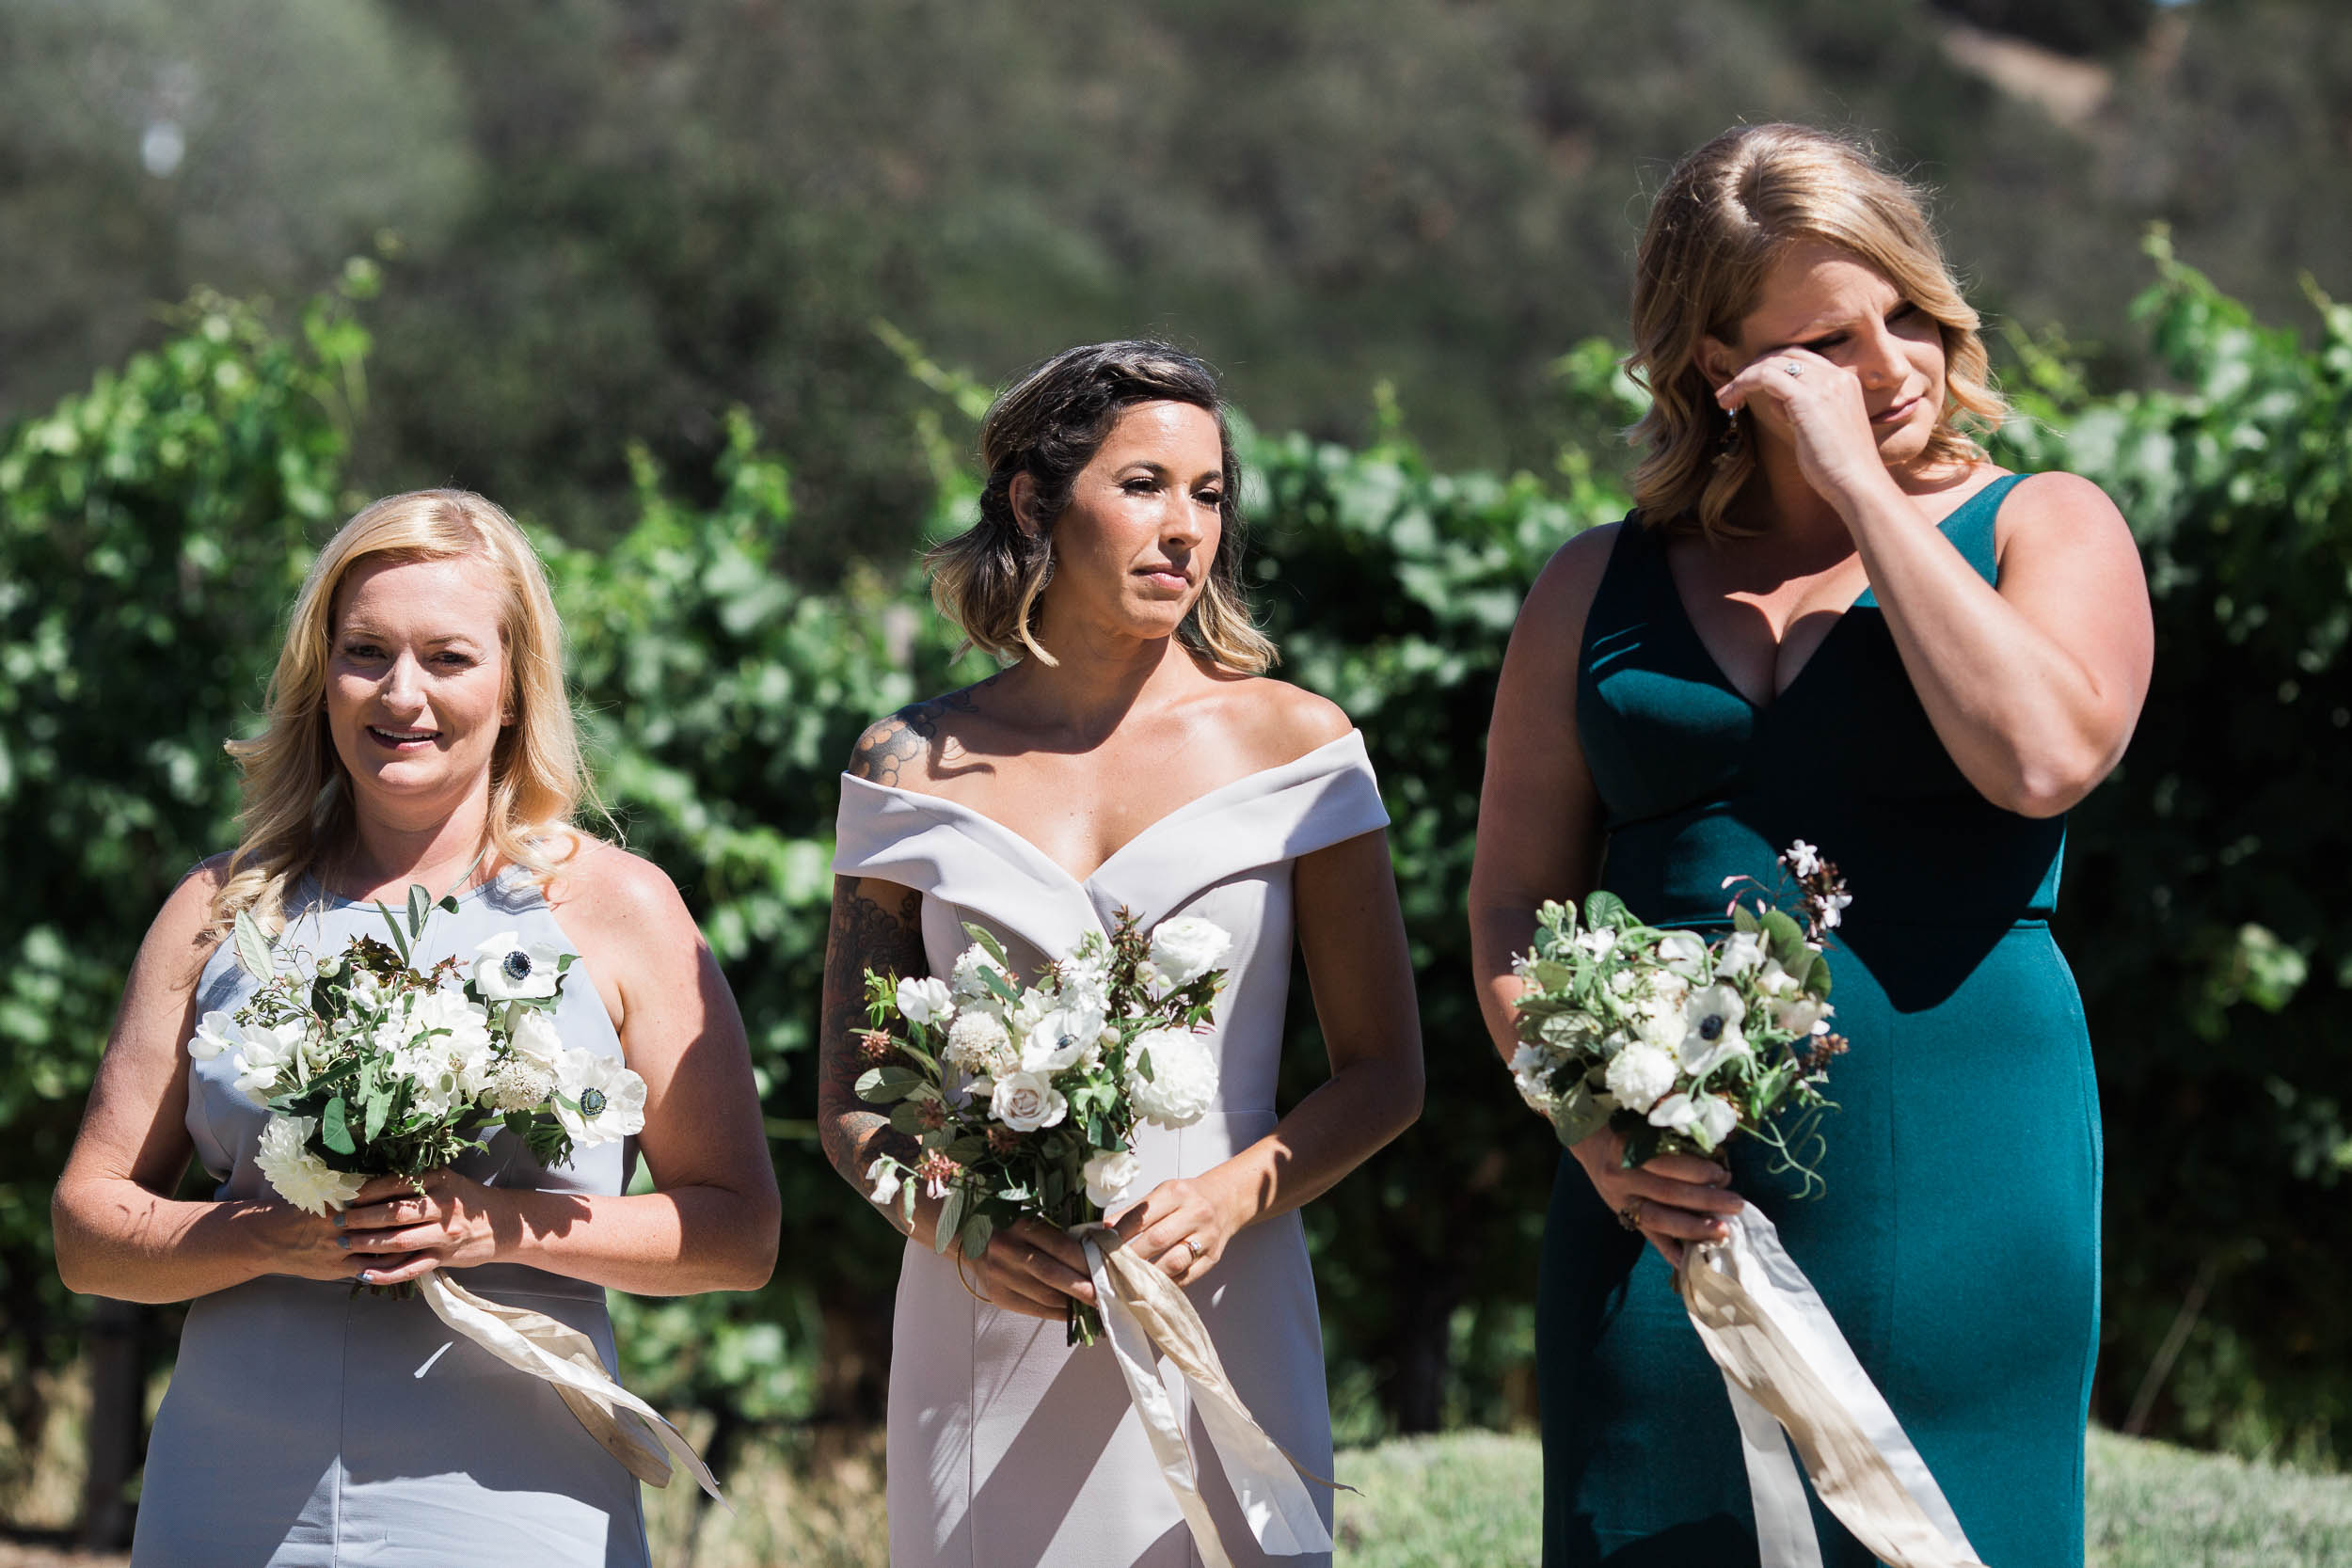 045_072118_D+K_Holman Ranch Wedding_Buena Lane Photography_2698TV copy.jpg